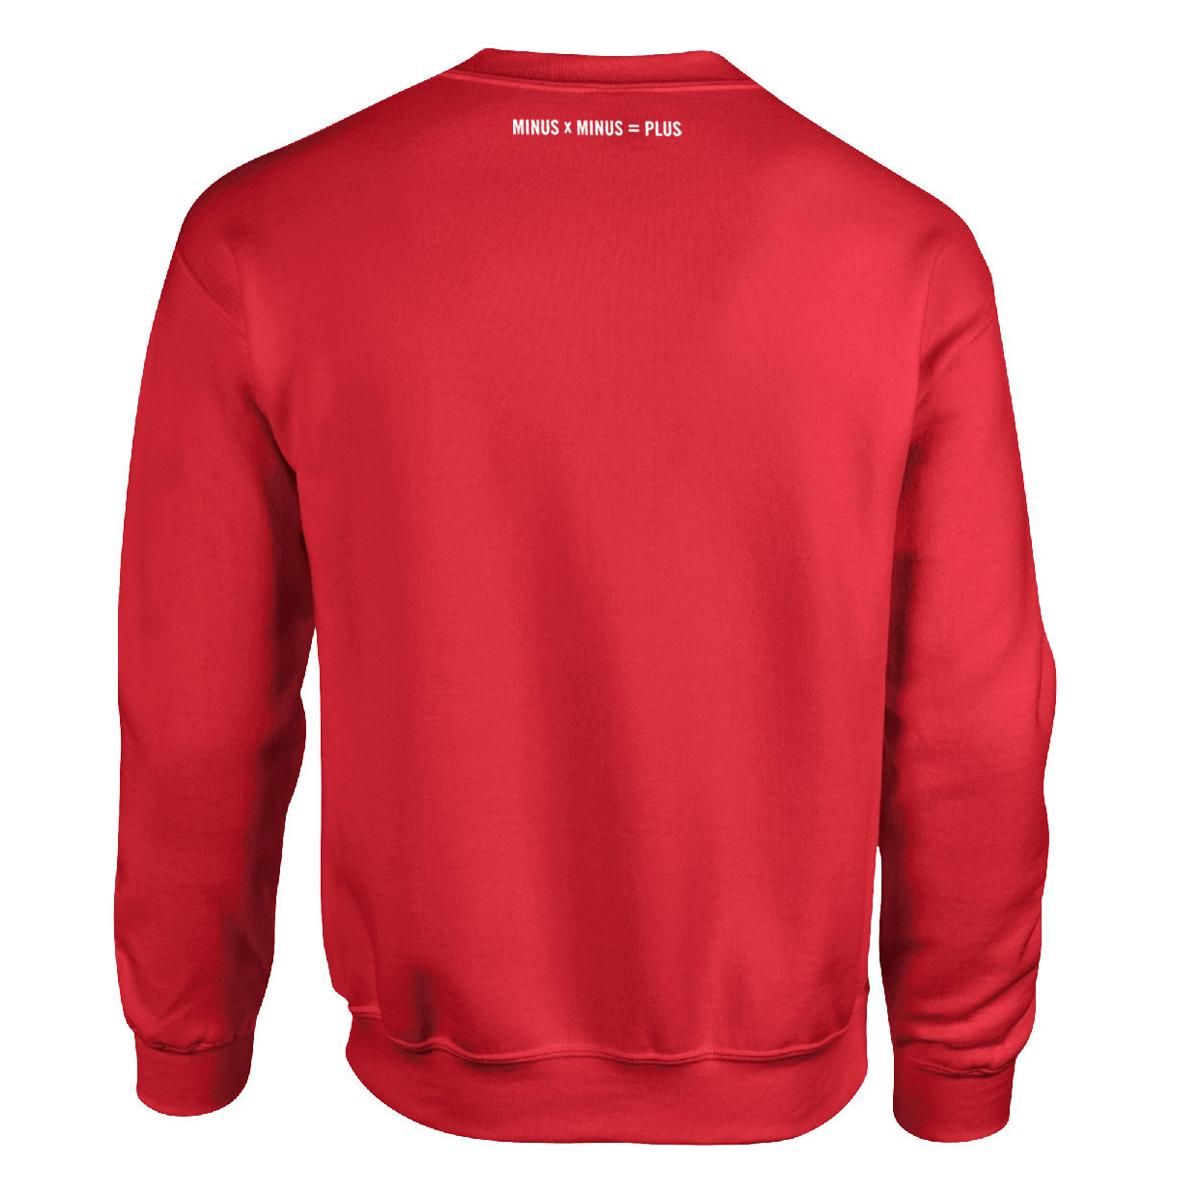 Disarstar Minus Sweater Sweater rot